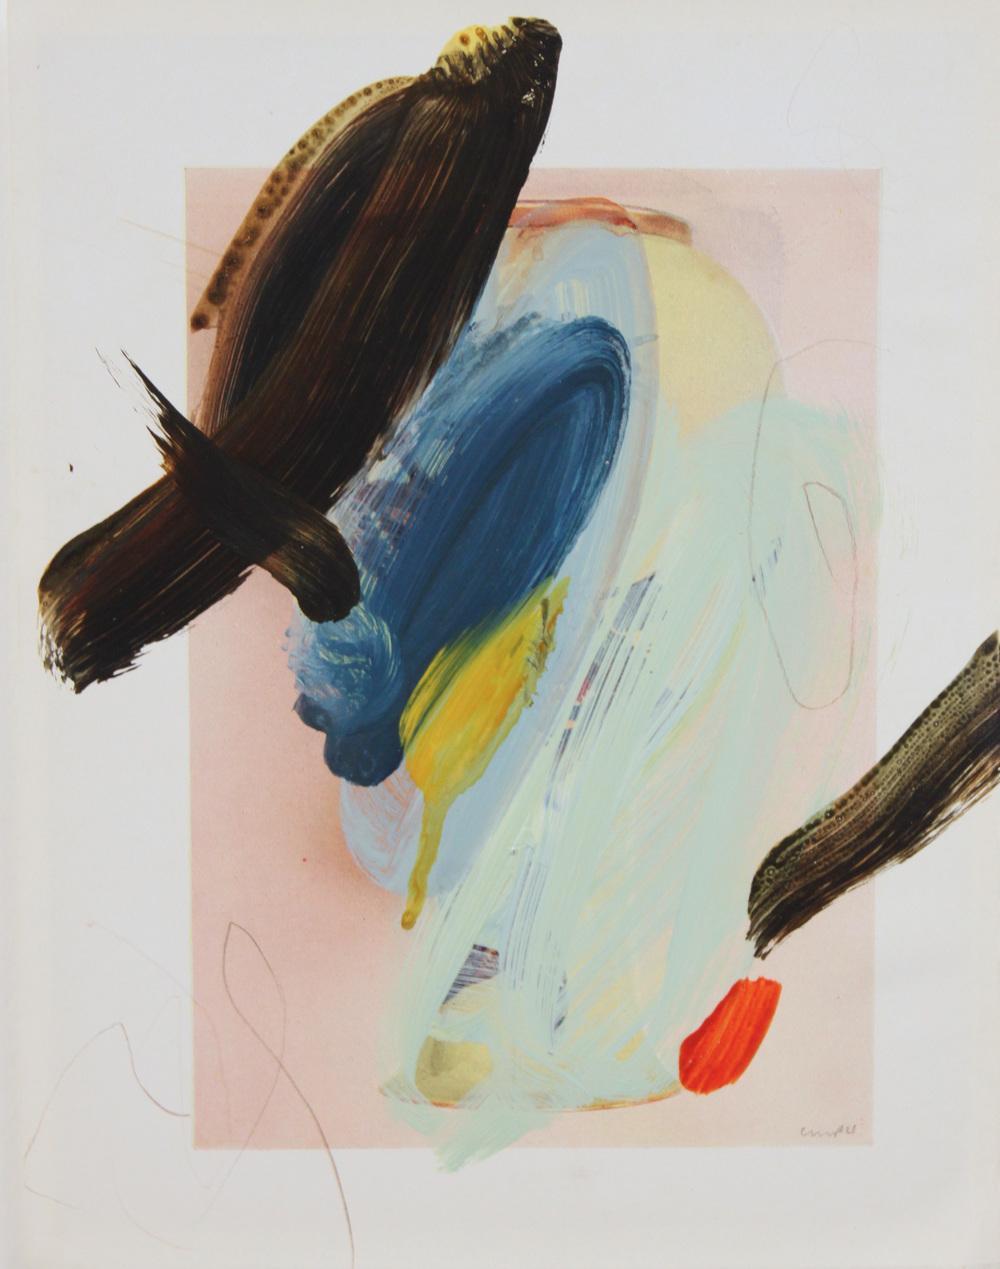 Caroline Pedler Drawn To Swords 15 x 21 cm  acrylic on paper  £ 425